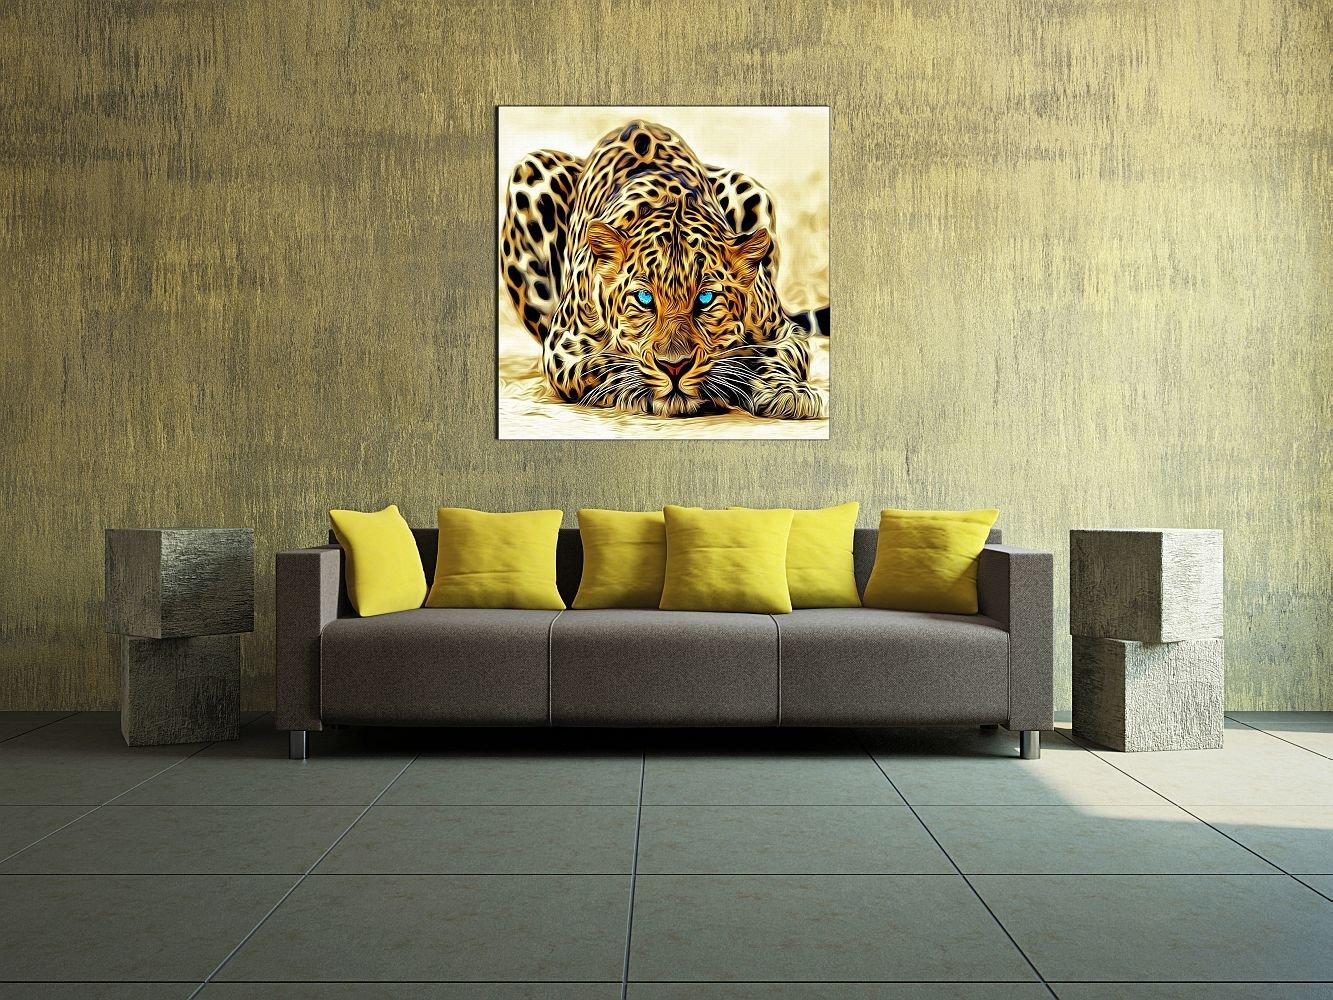 Amazon.com: Startonight Canvas Wall Art Leopard, Animals USA Design ...